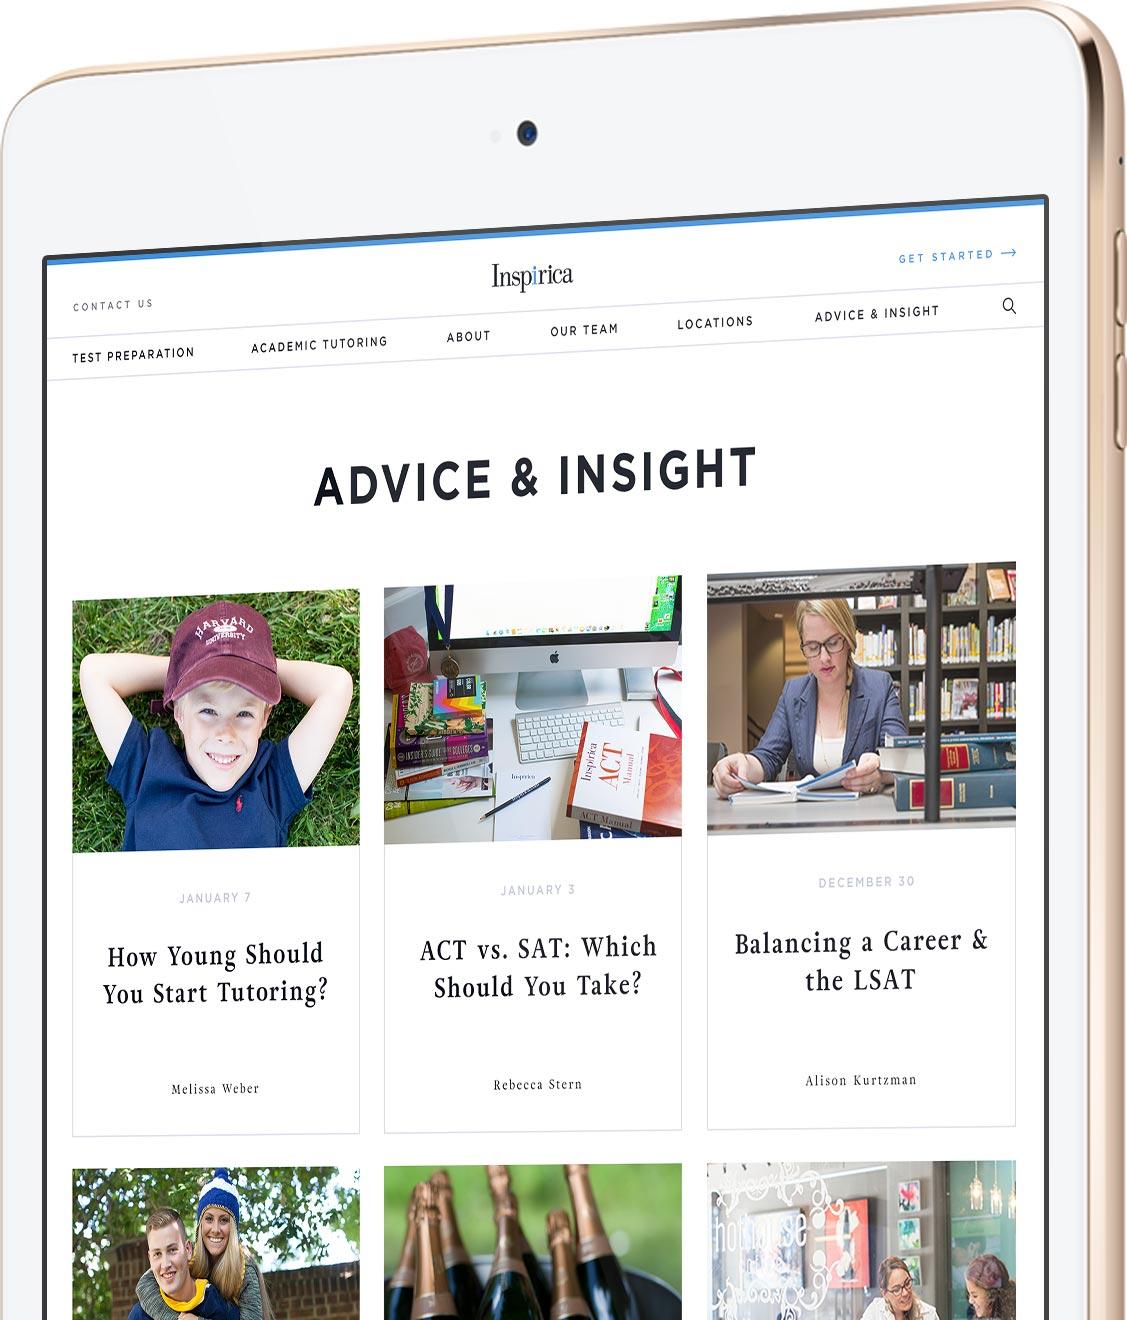 inspirica-advice-insight